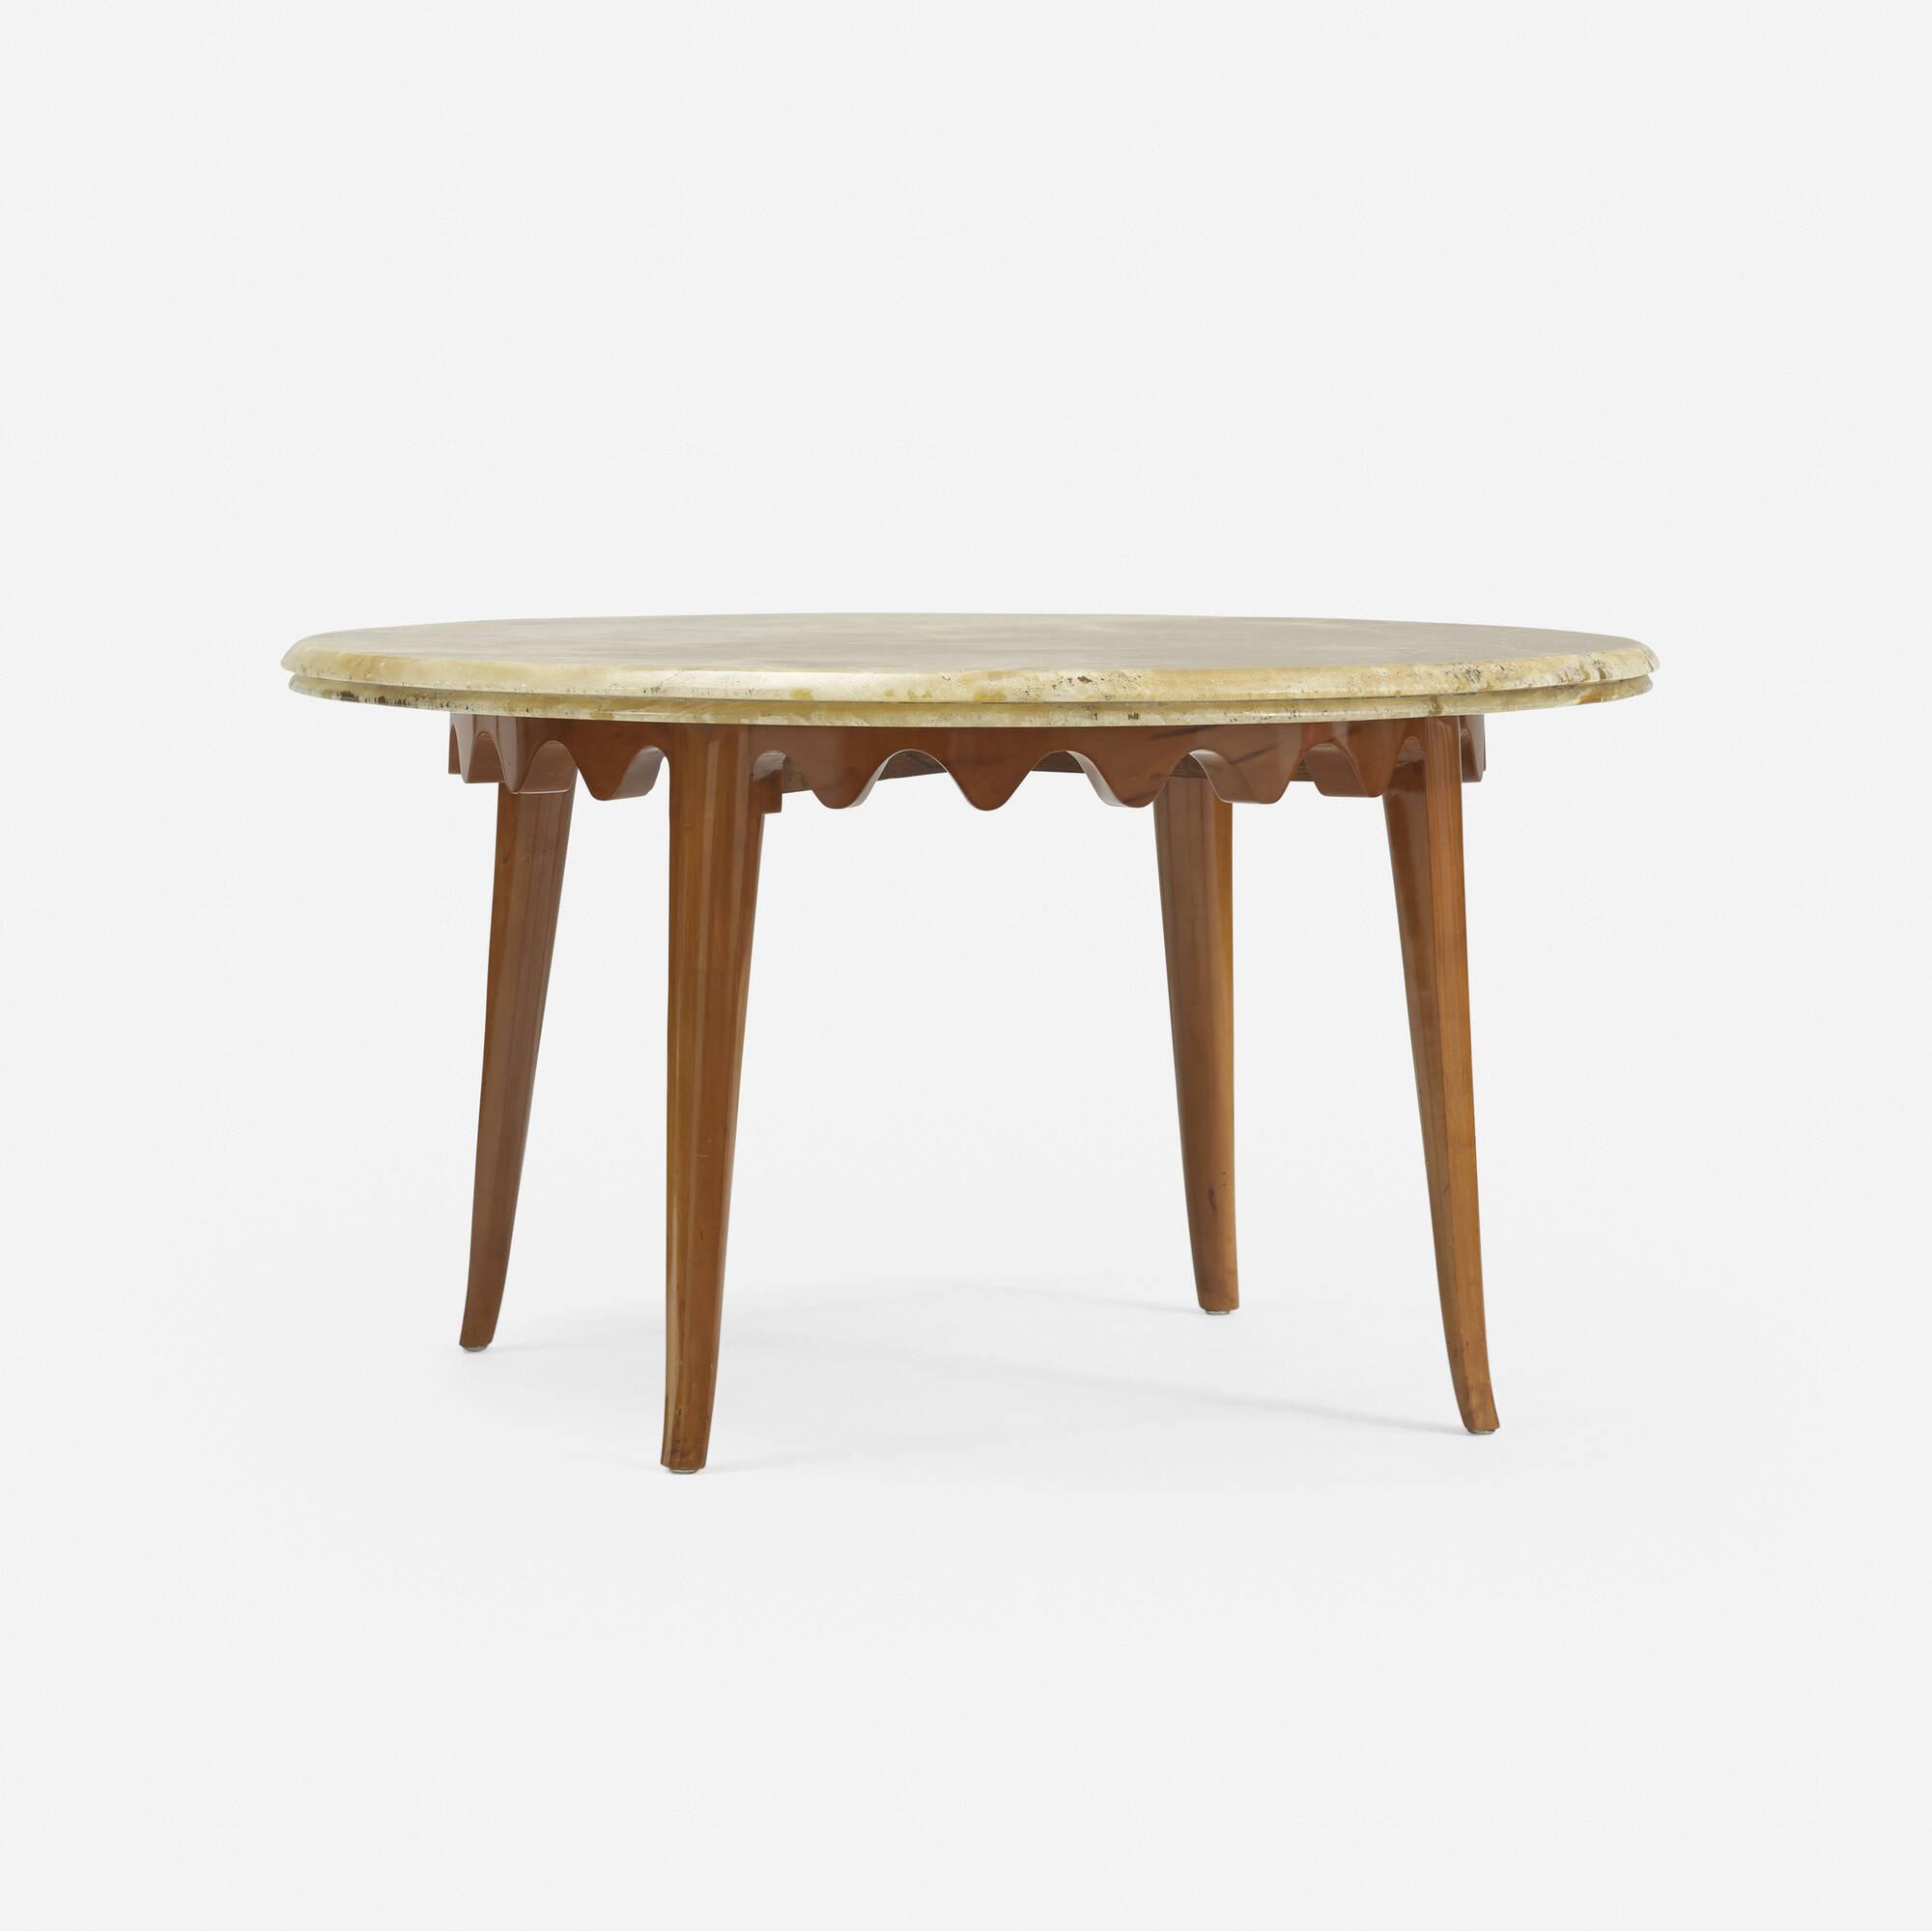 178: Osvaldo Borsani / coffee table (1 of 2)